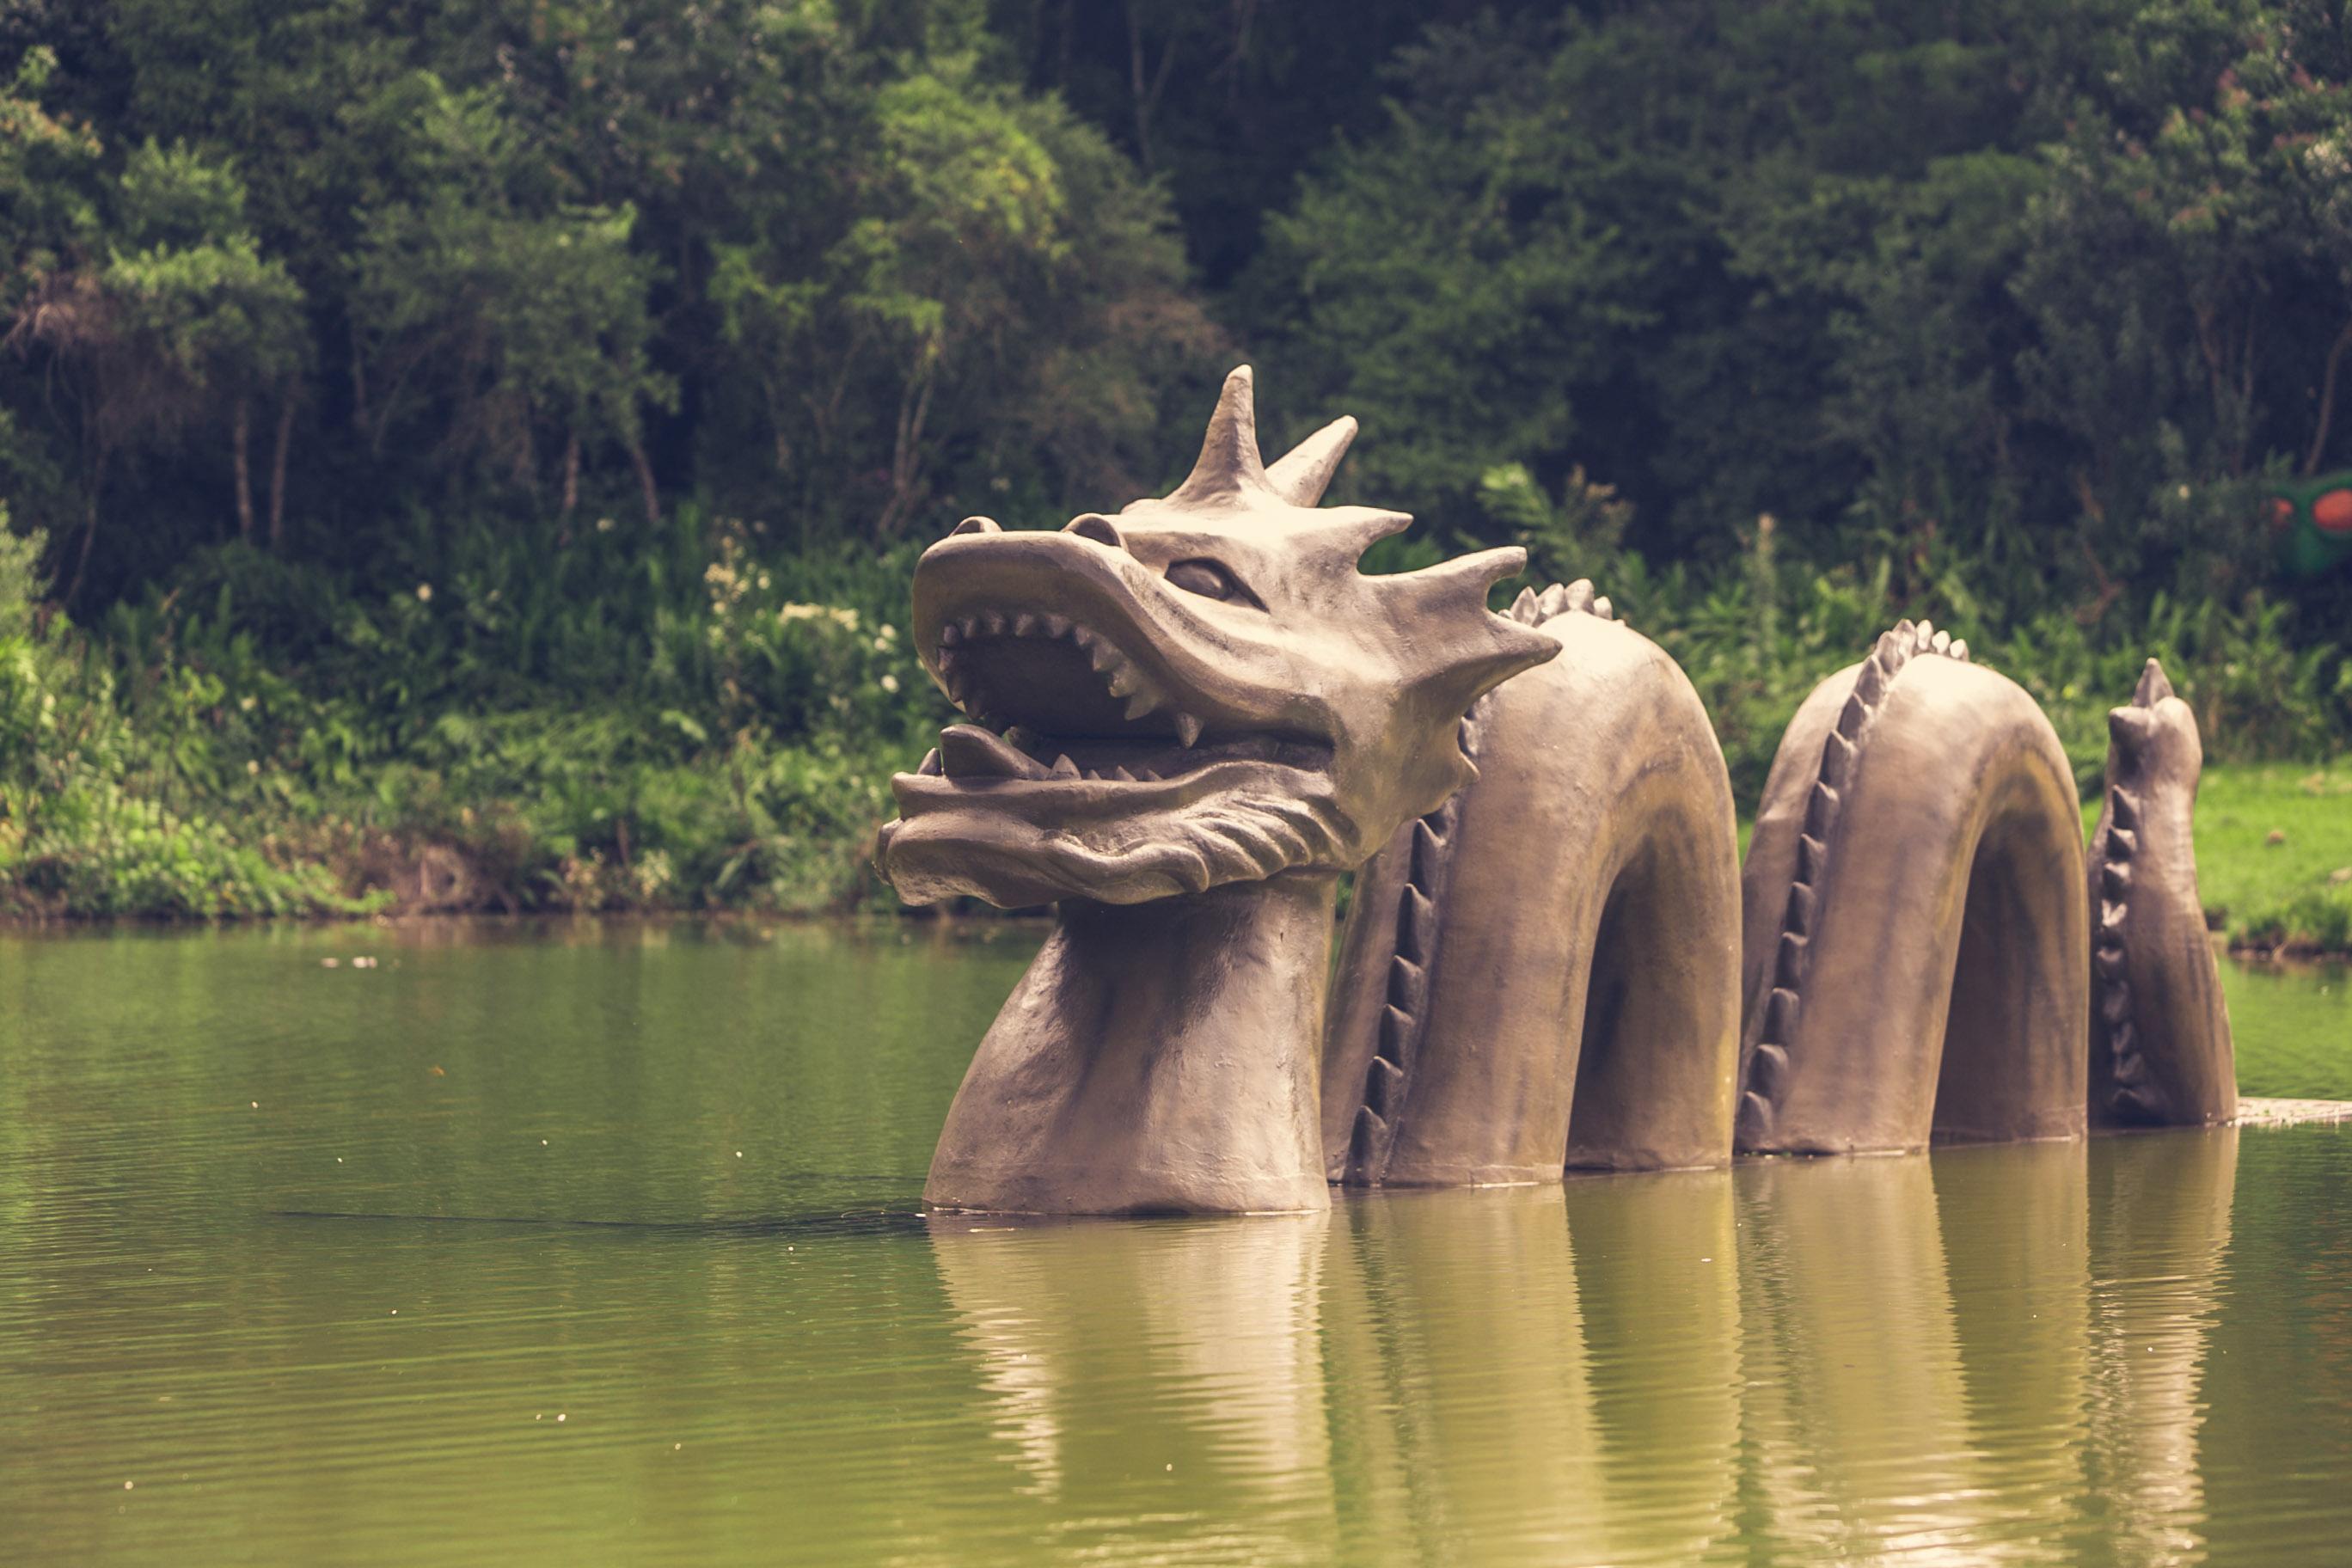 Warung Day Festival, um sonho real